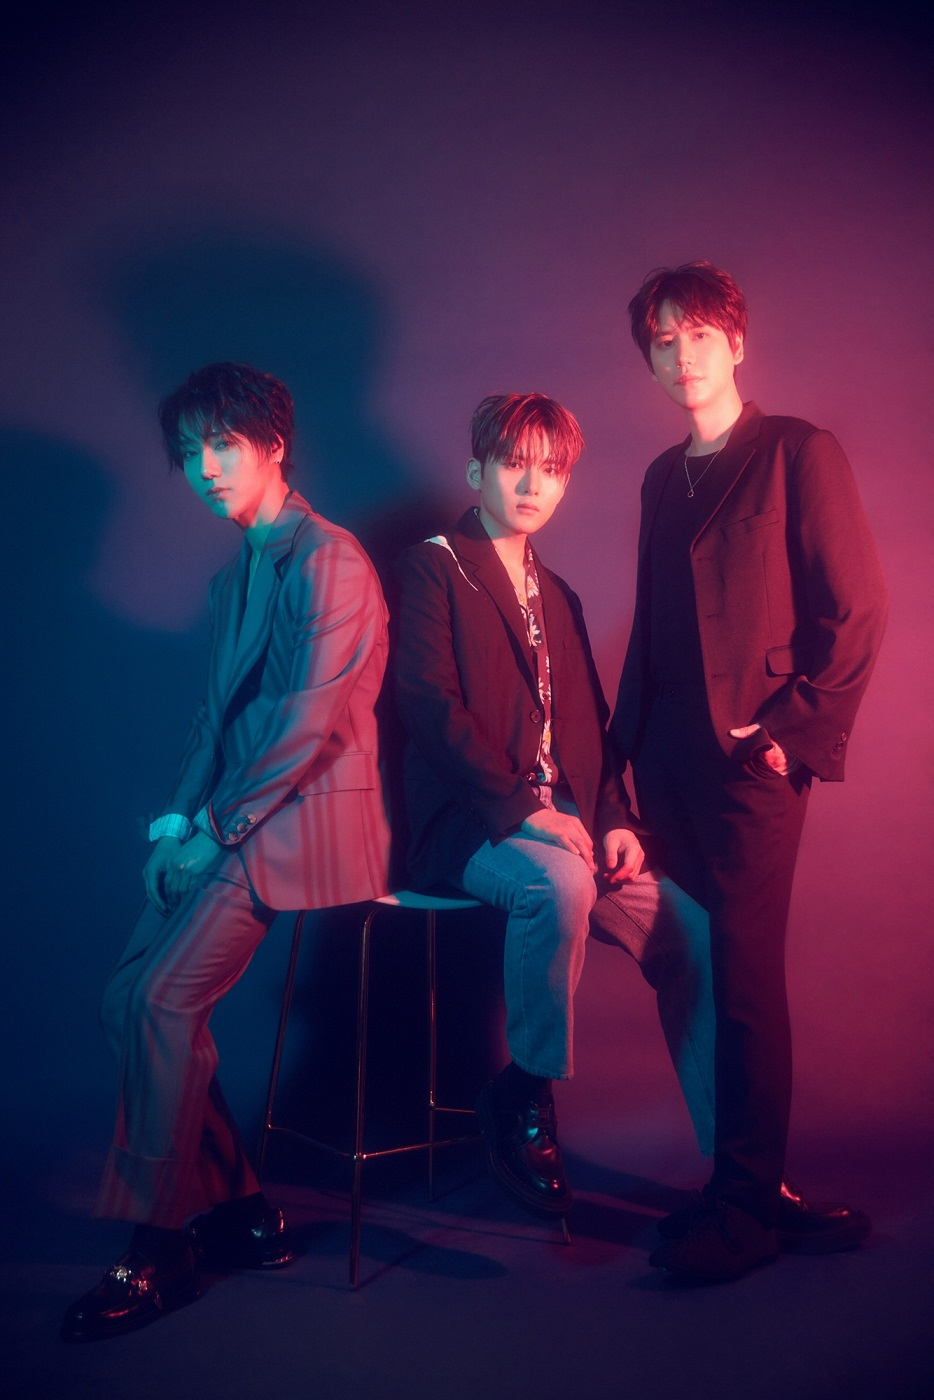 [Pr Image 4] SUPER JUNIOR-K.R.Y. - The 1st Mini Album 'When We Were Us'